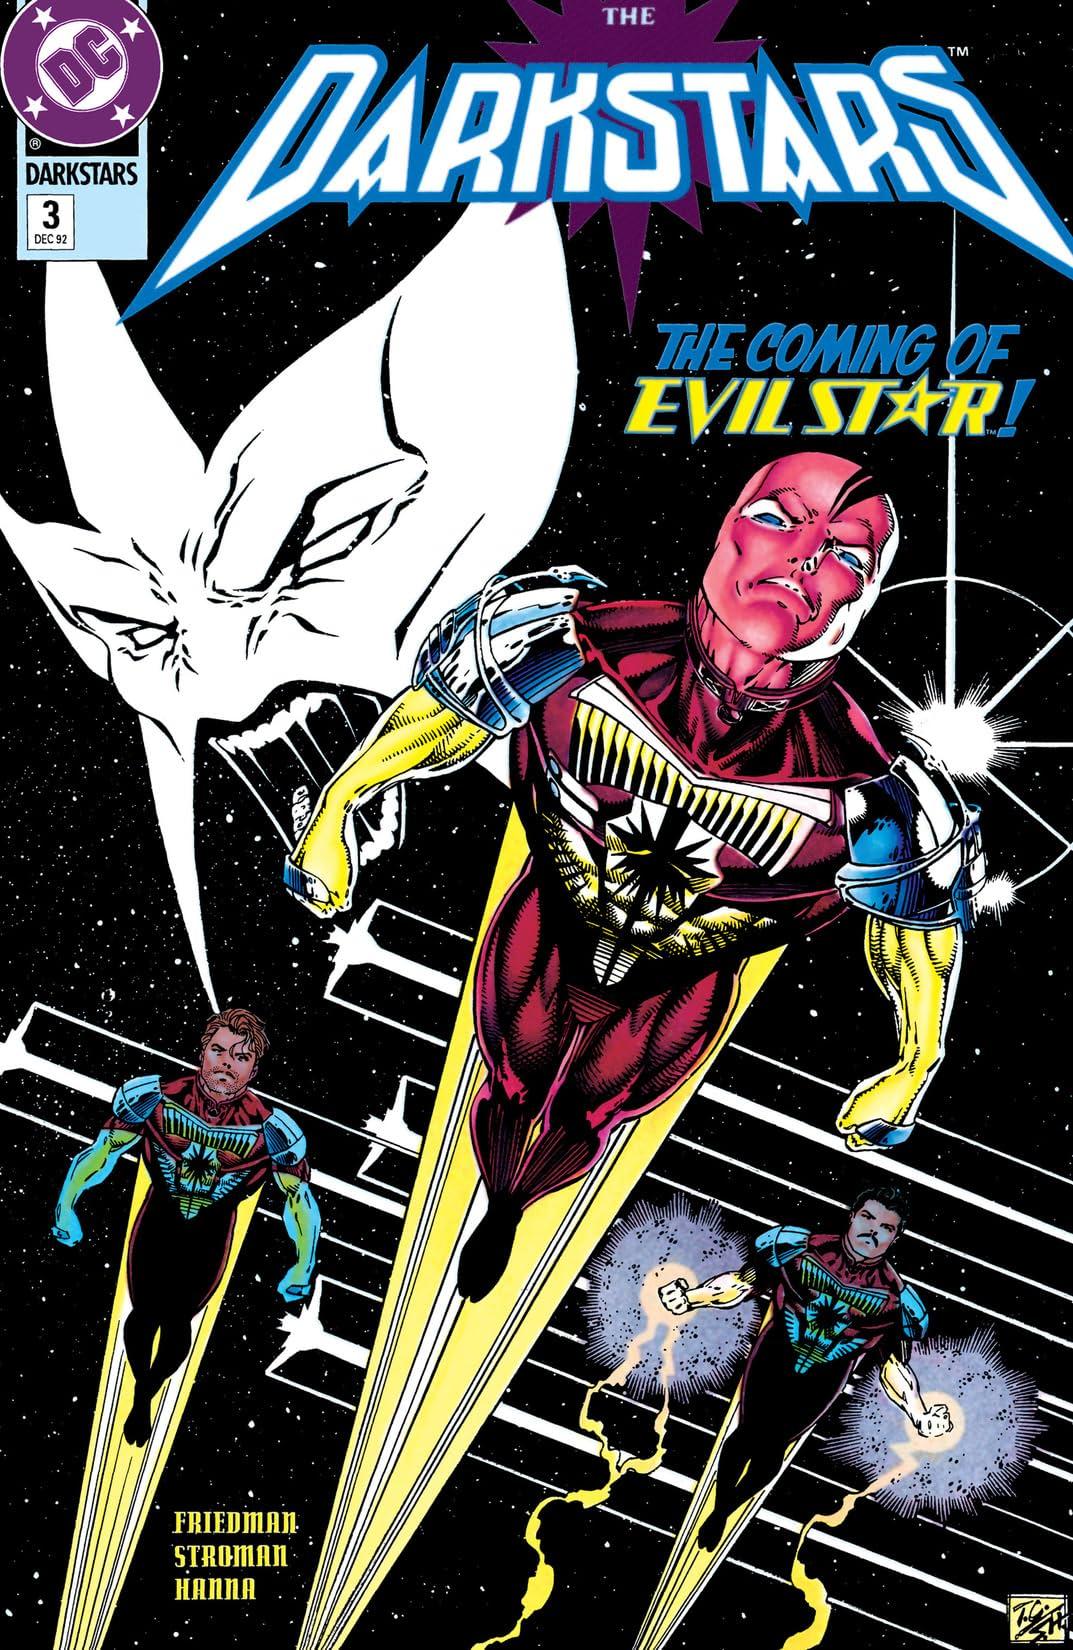 The Darkstars (1992-1996) #3